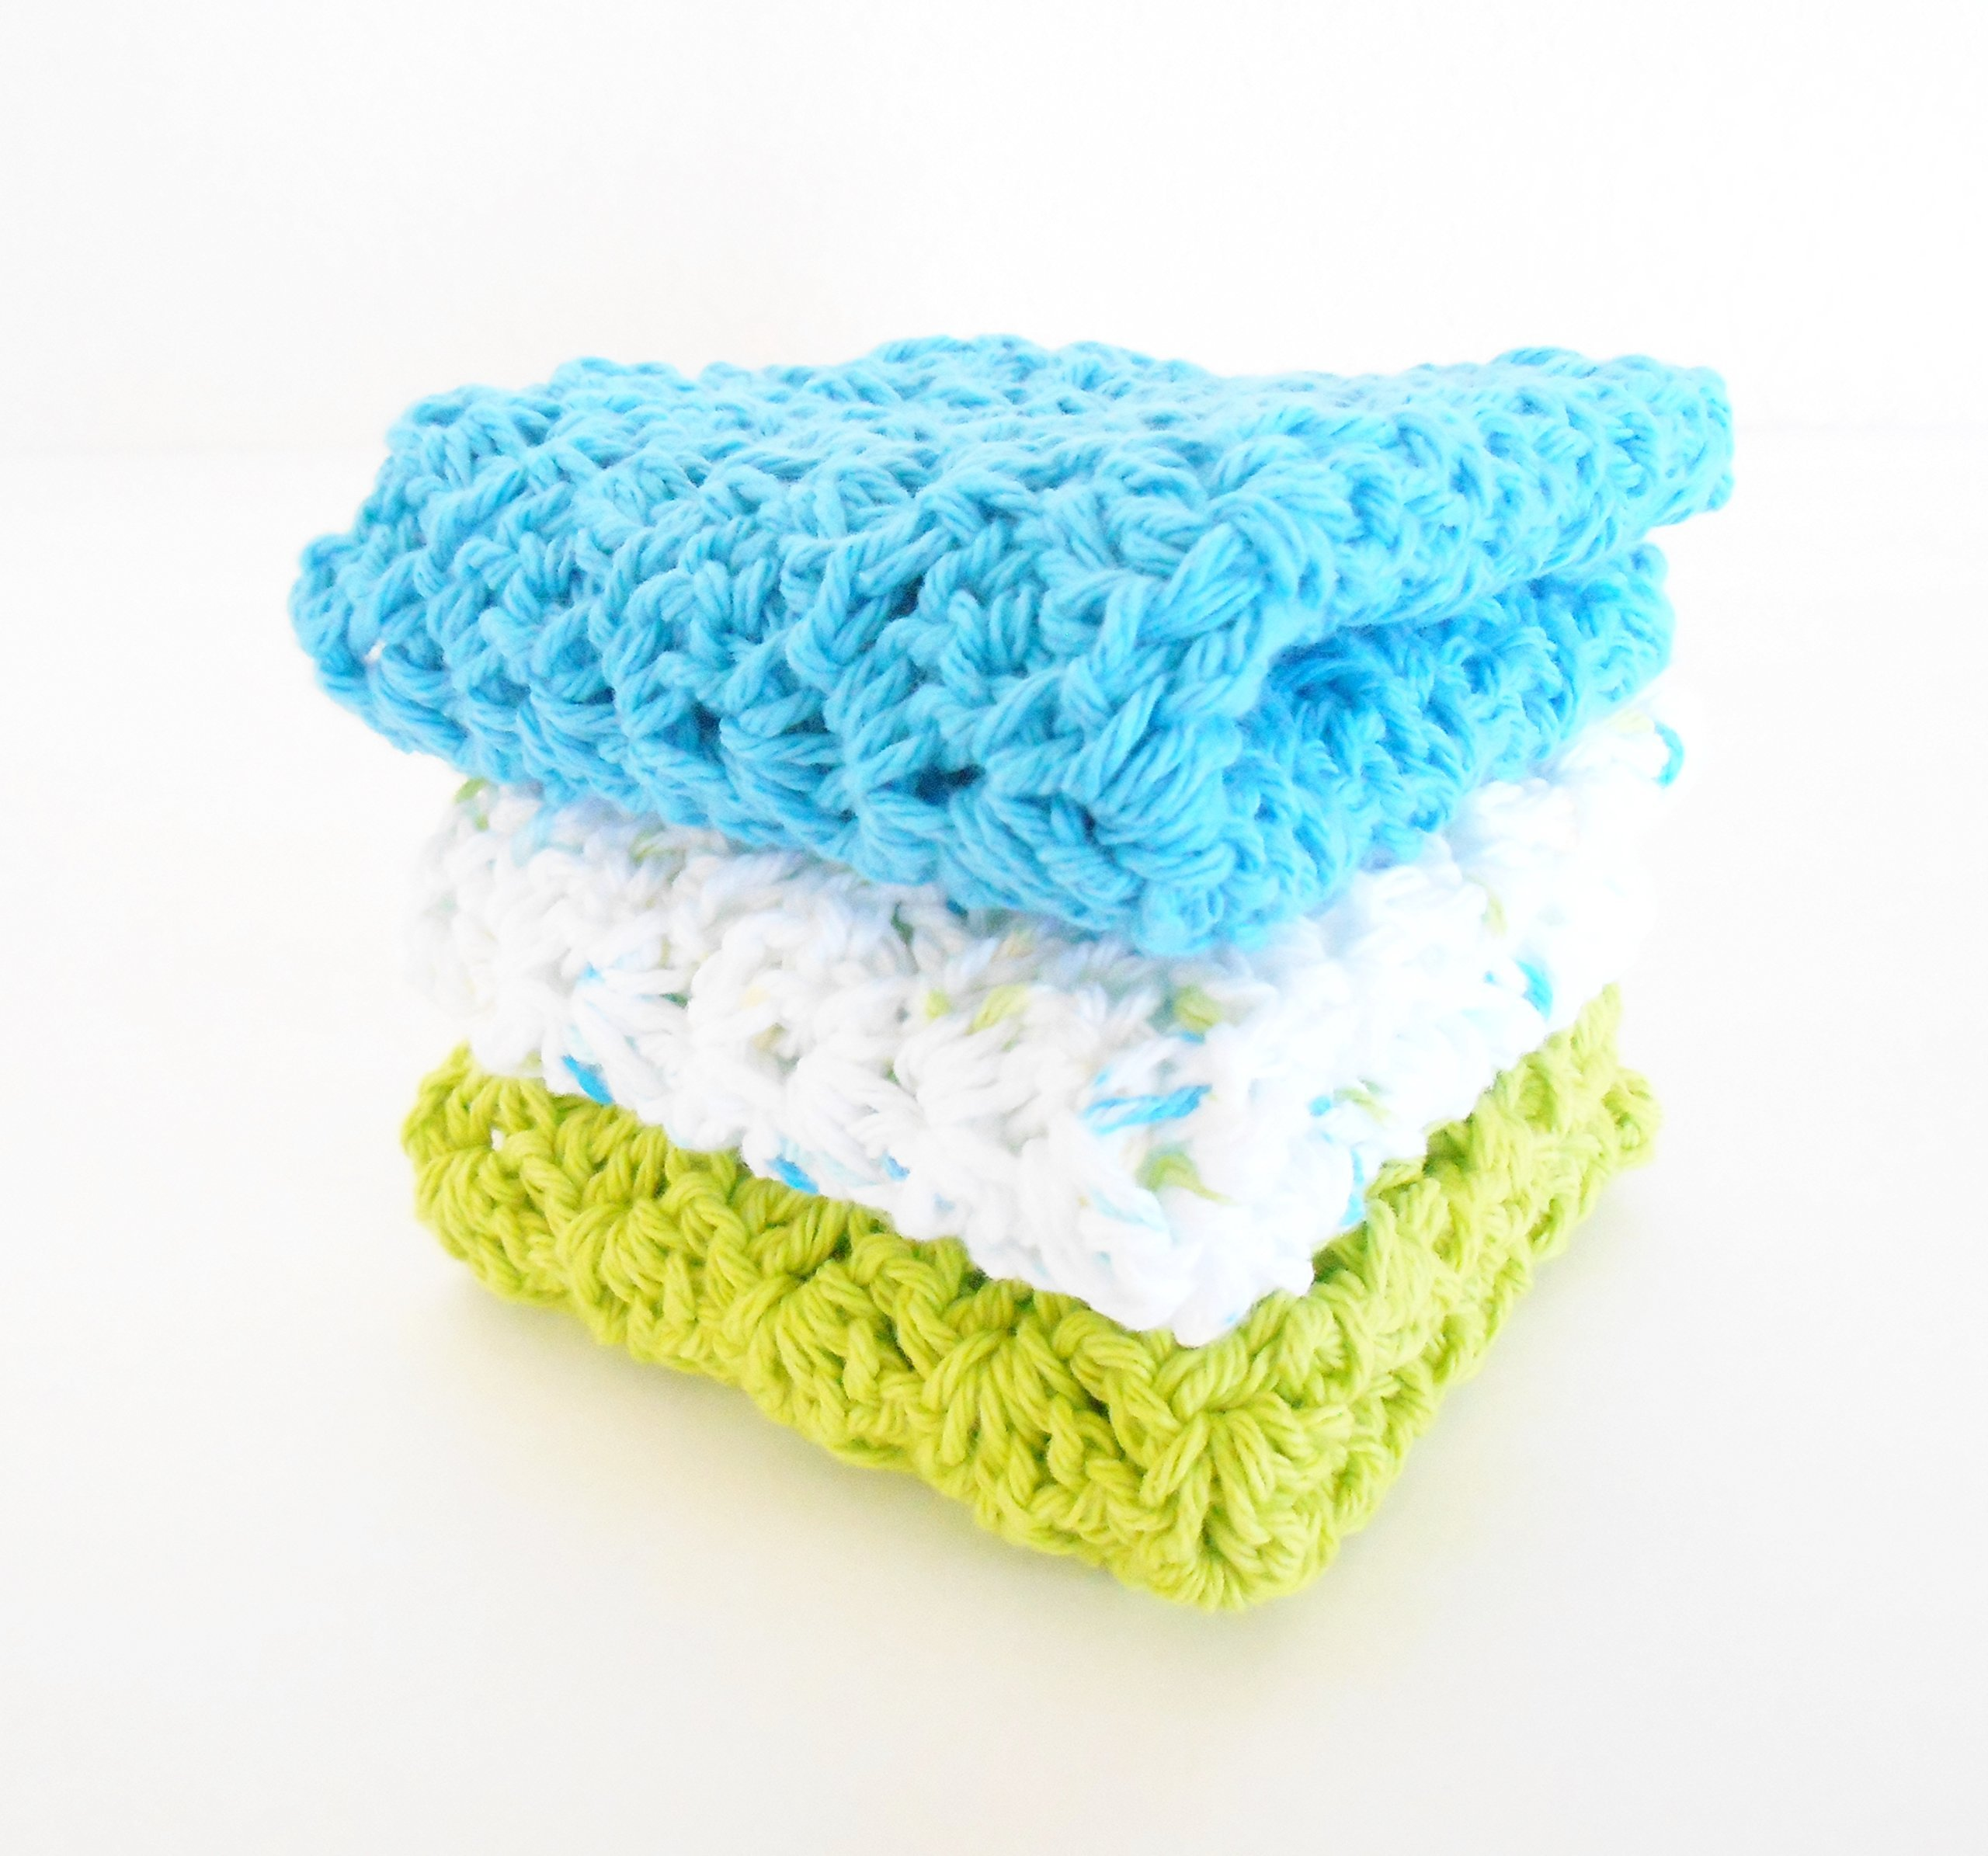 Crochet Kitchen Dishcloths, Set of Three, Lime Green, Ocean Blue, Multi